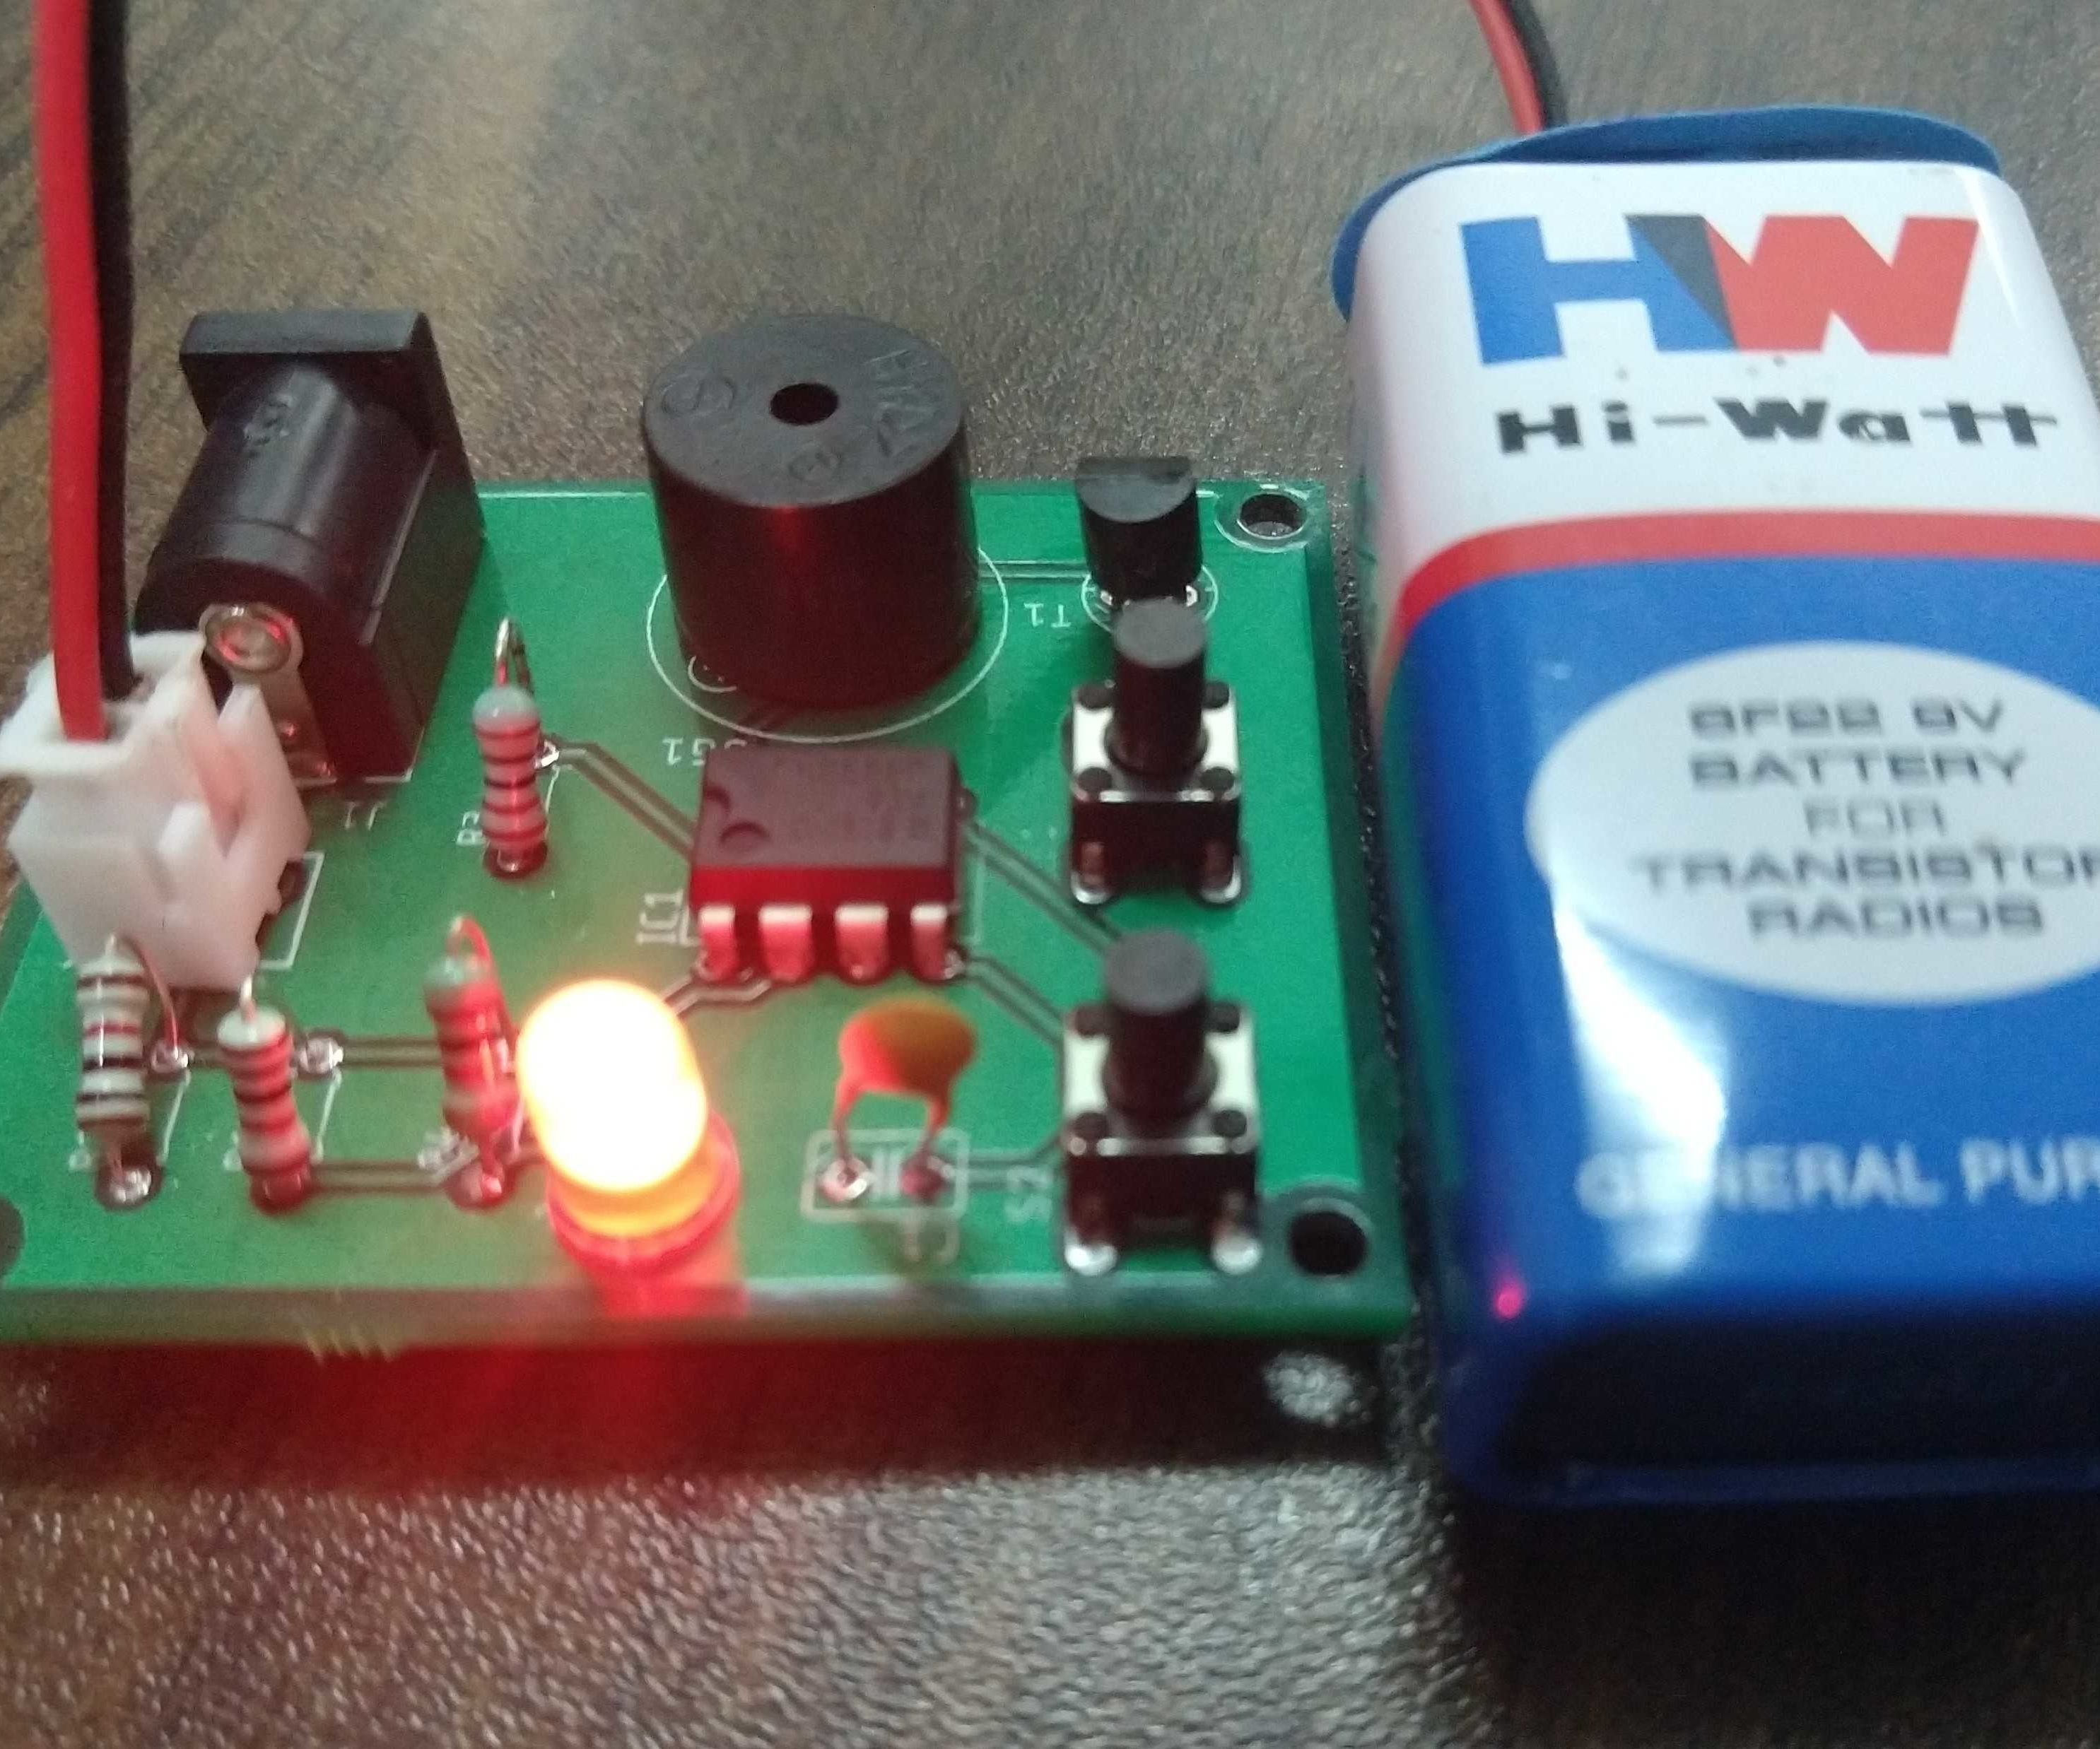 Panic Alarm Button Circuit Using 555 Timer IC (Part-2)